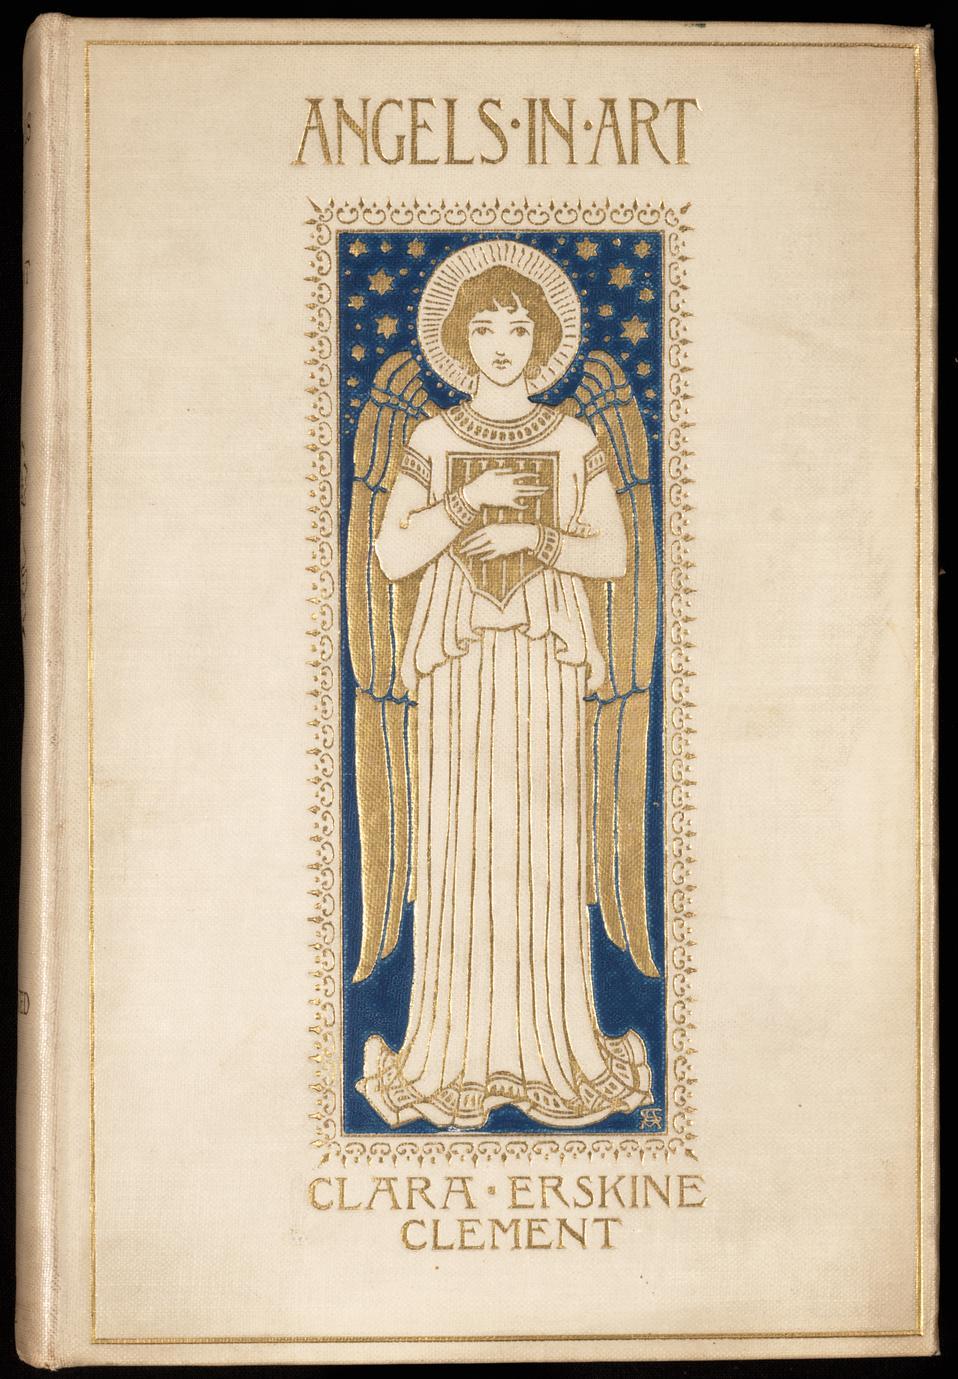 Angels in art (1 of 3)